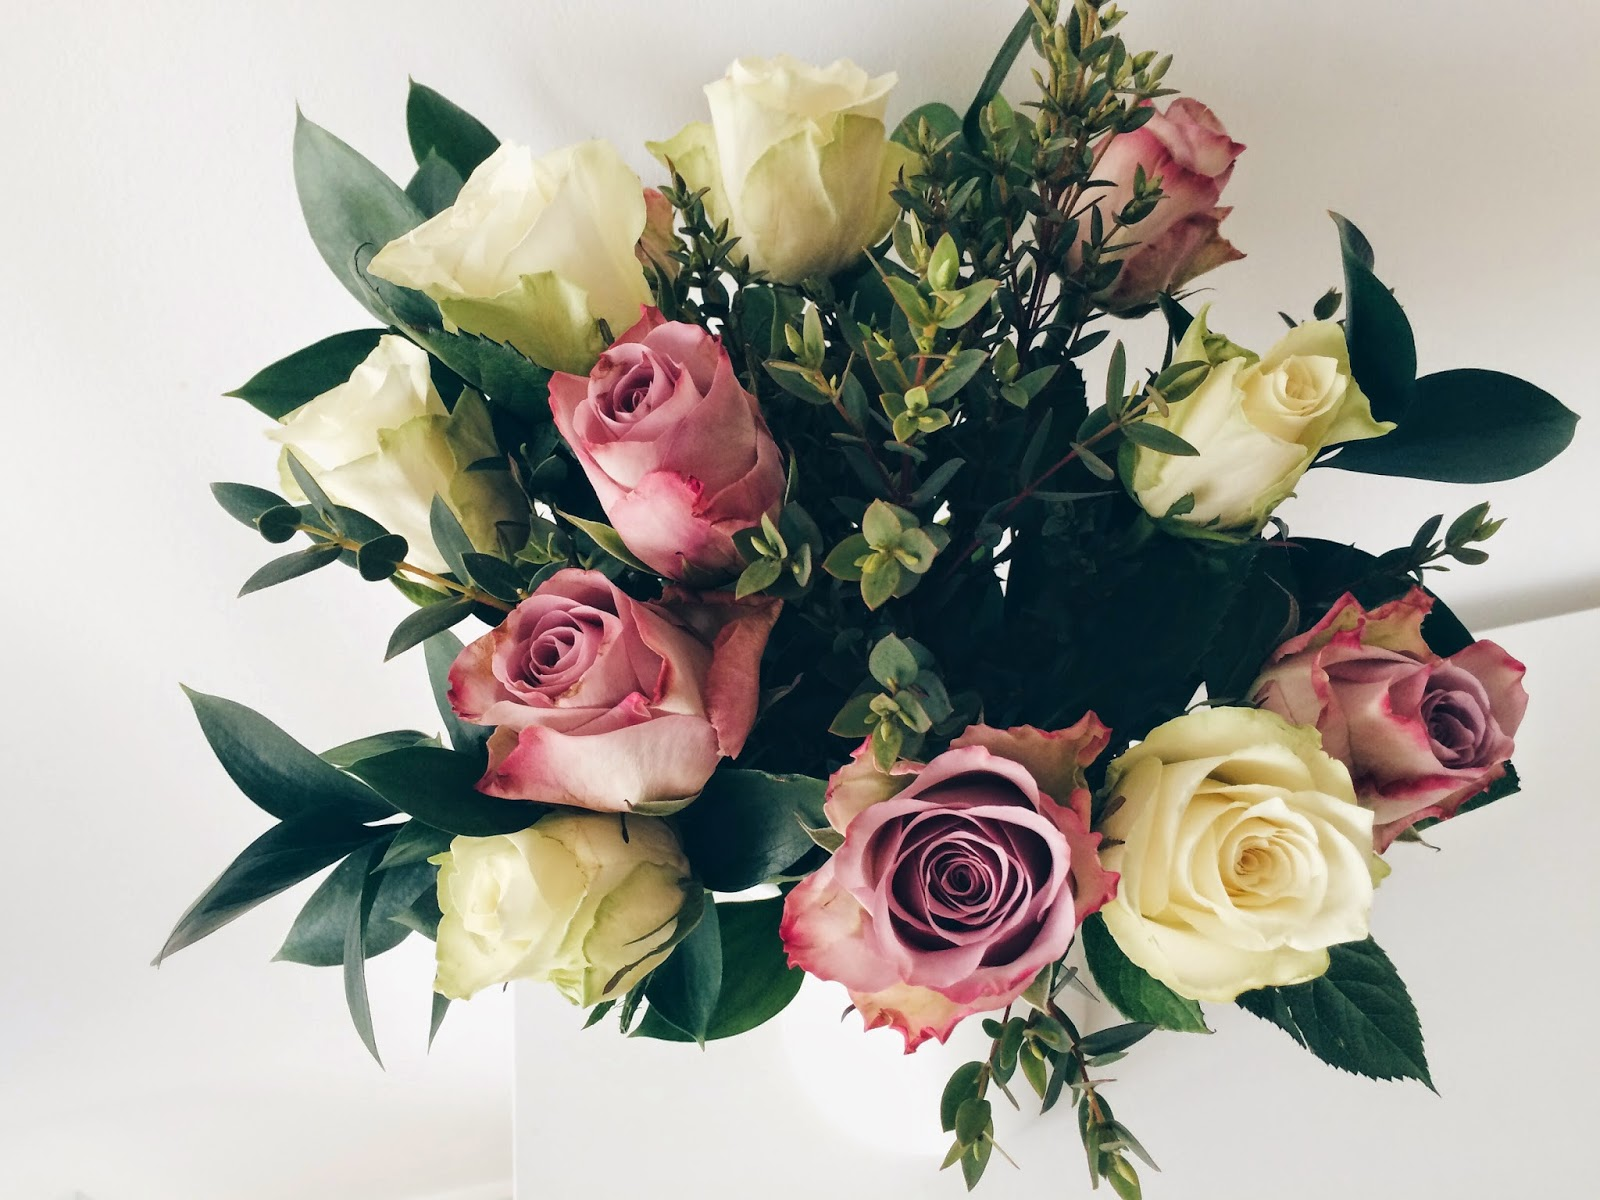 debenhams flower delivery valentines day occasion bouquet floral arrangements